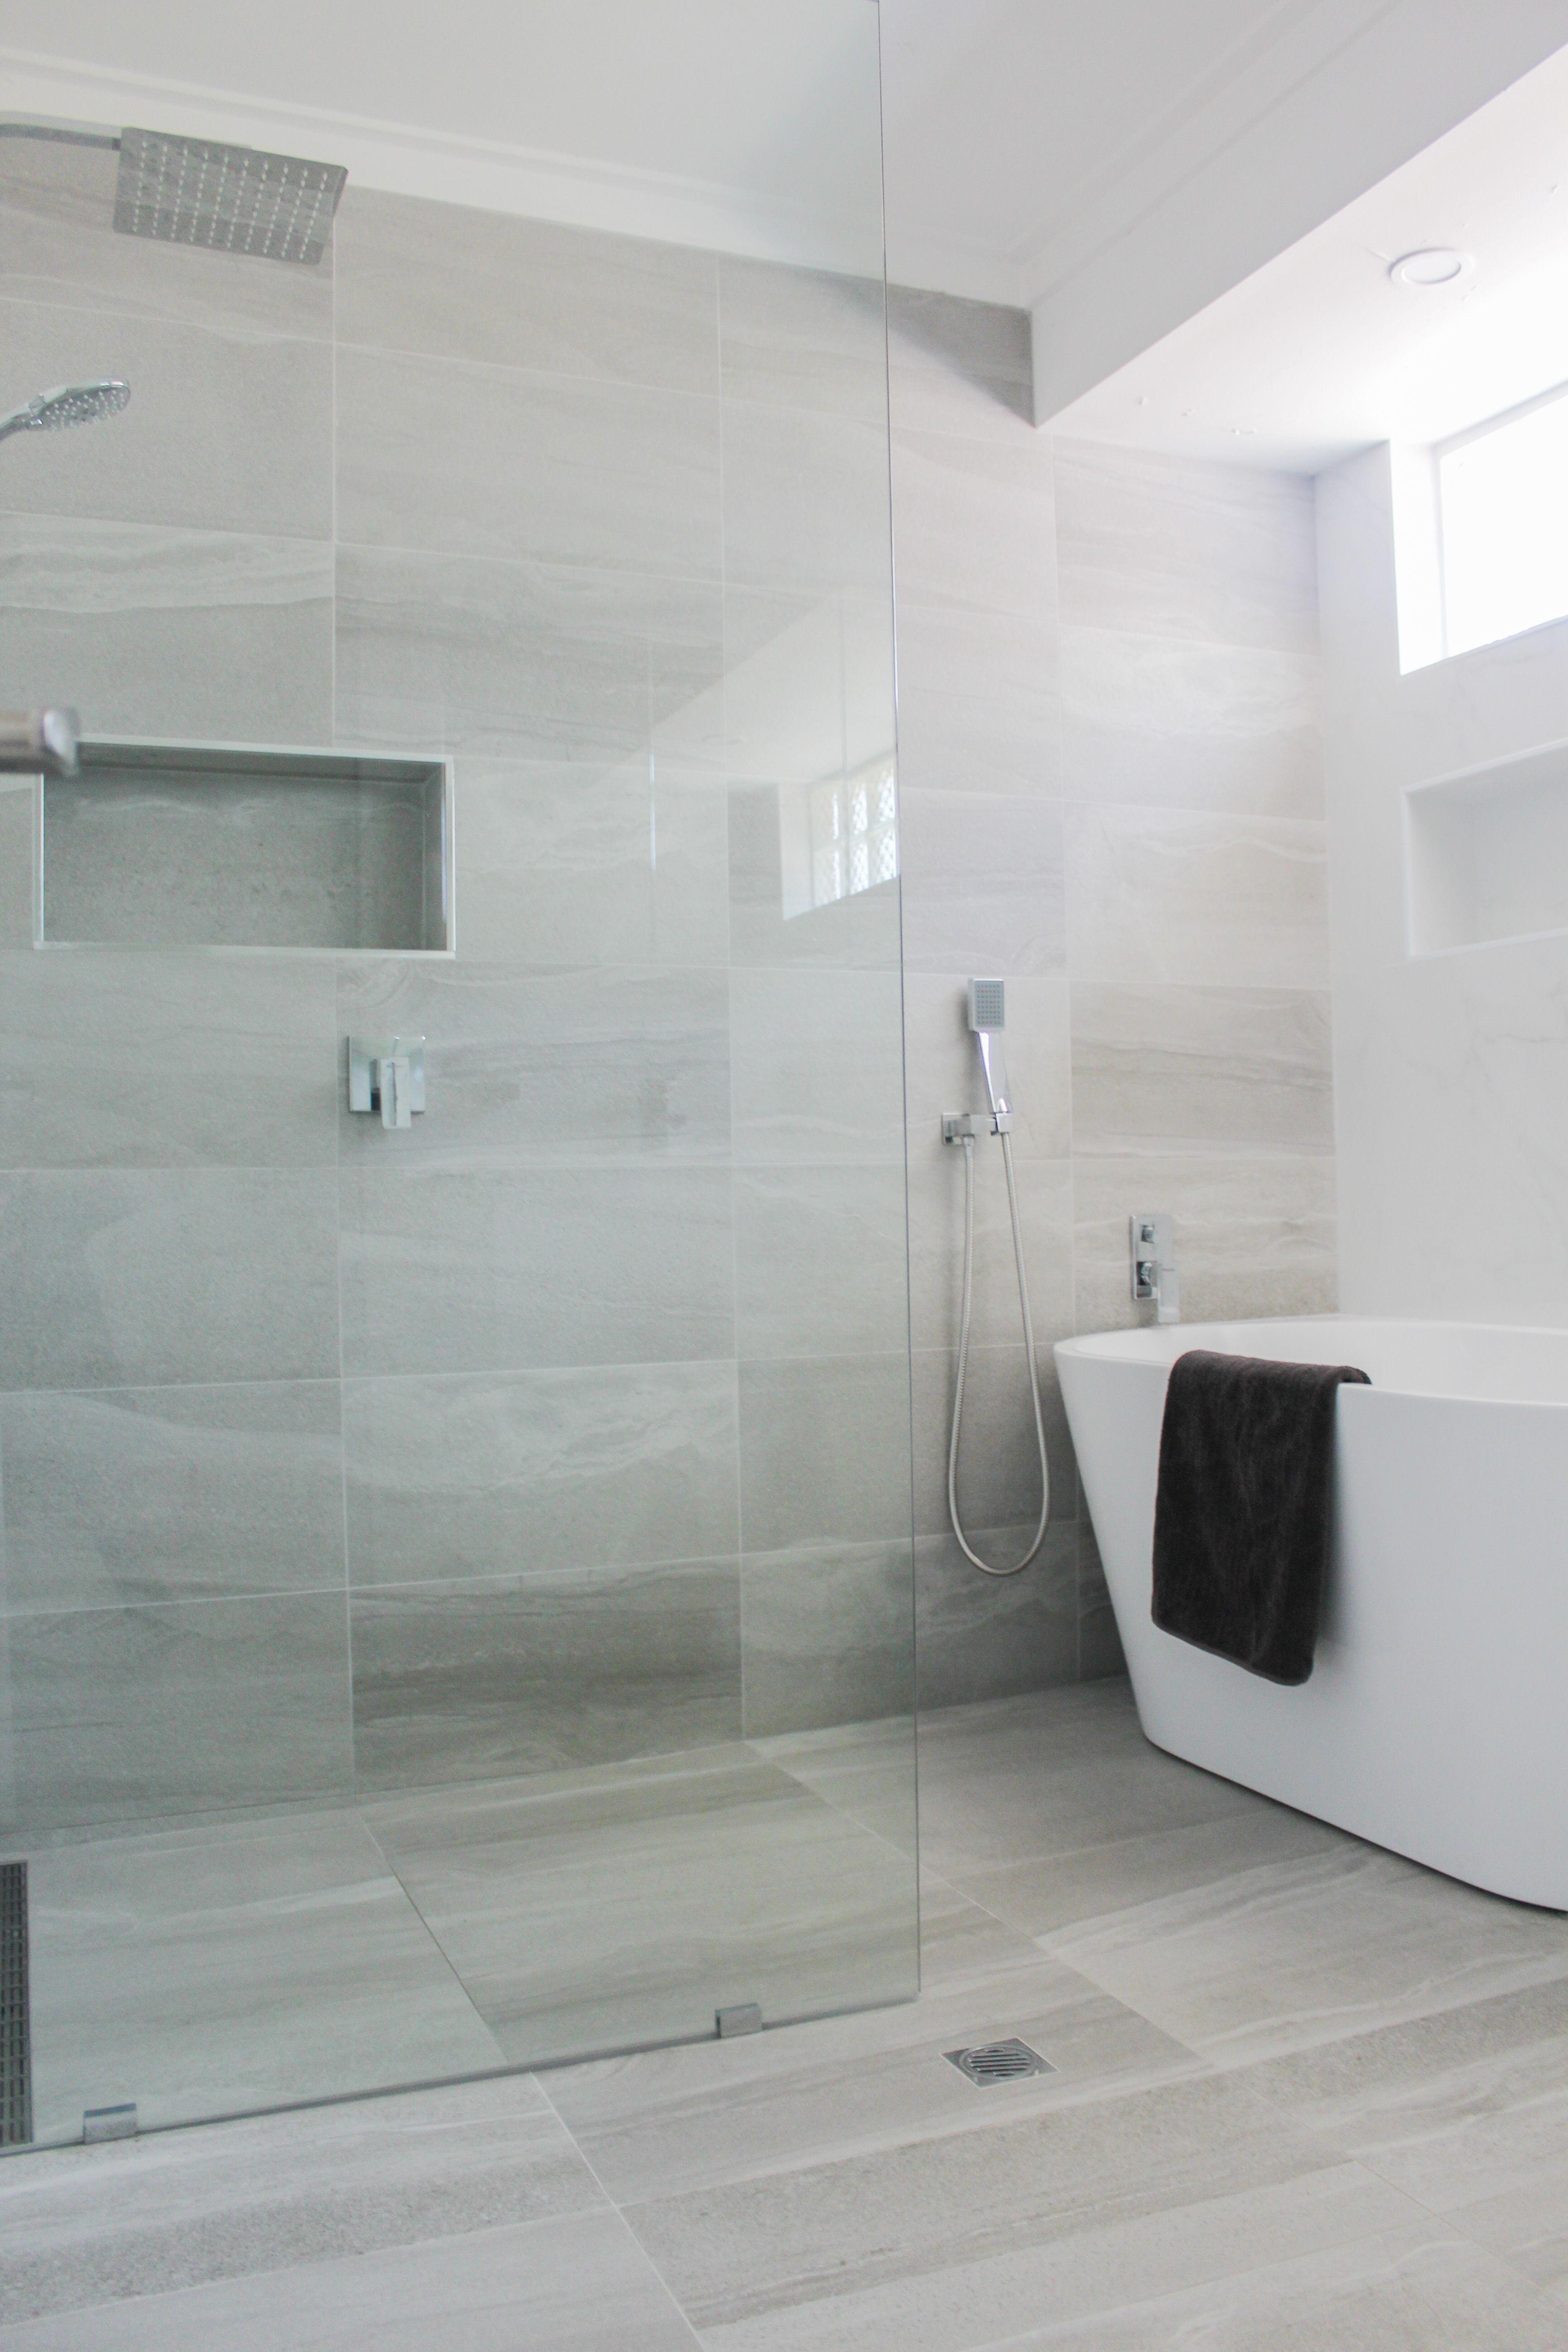 Walk In Wet Room Designs: Most Recent Photos Bathroom Renovations Walk In Thoughts